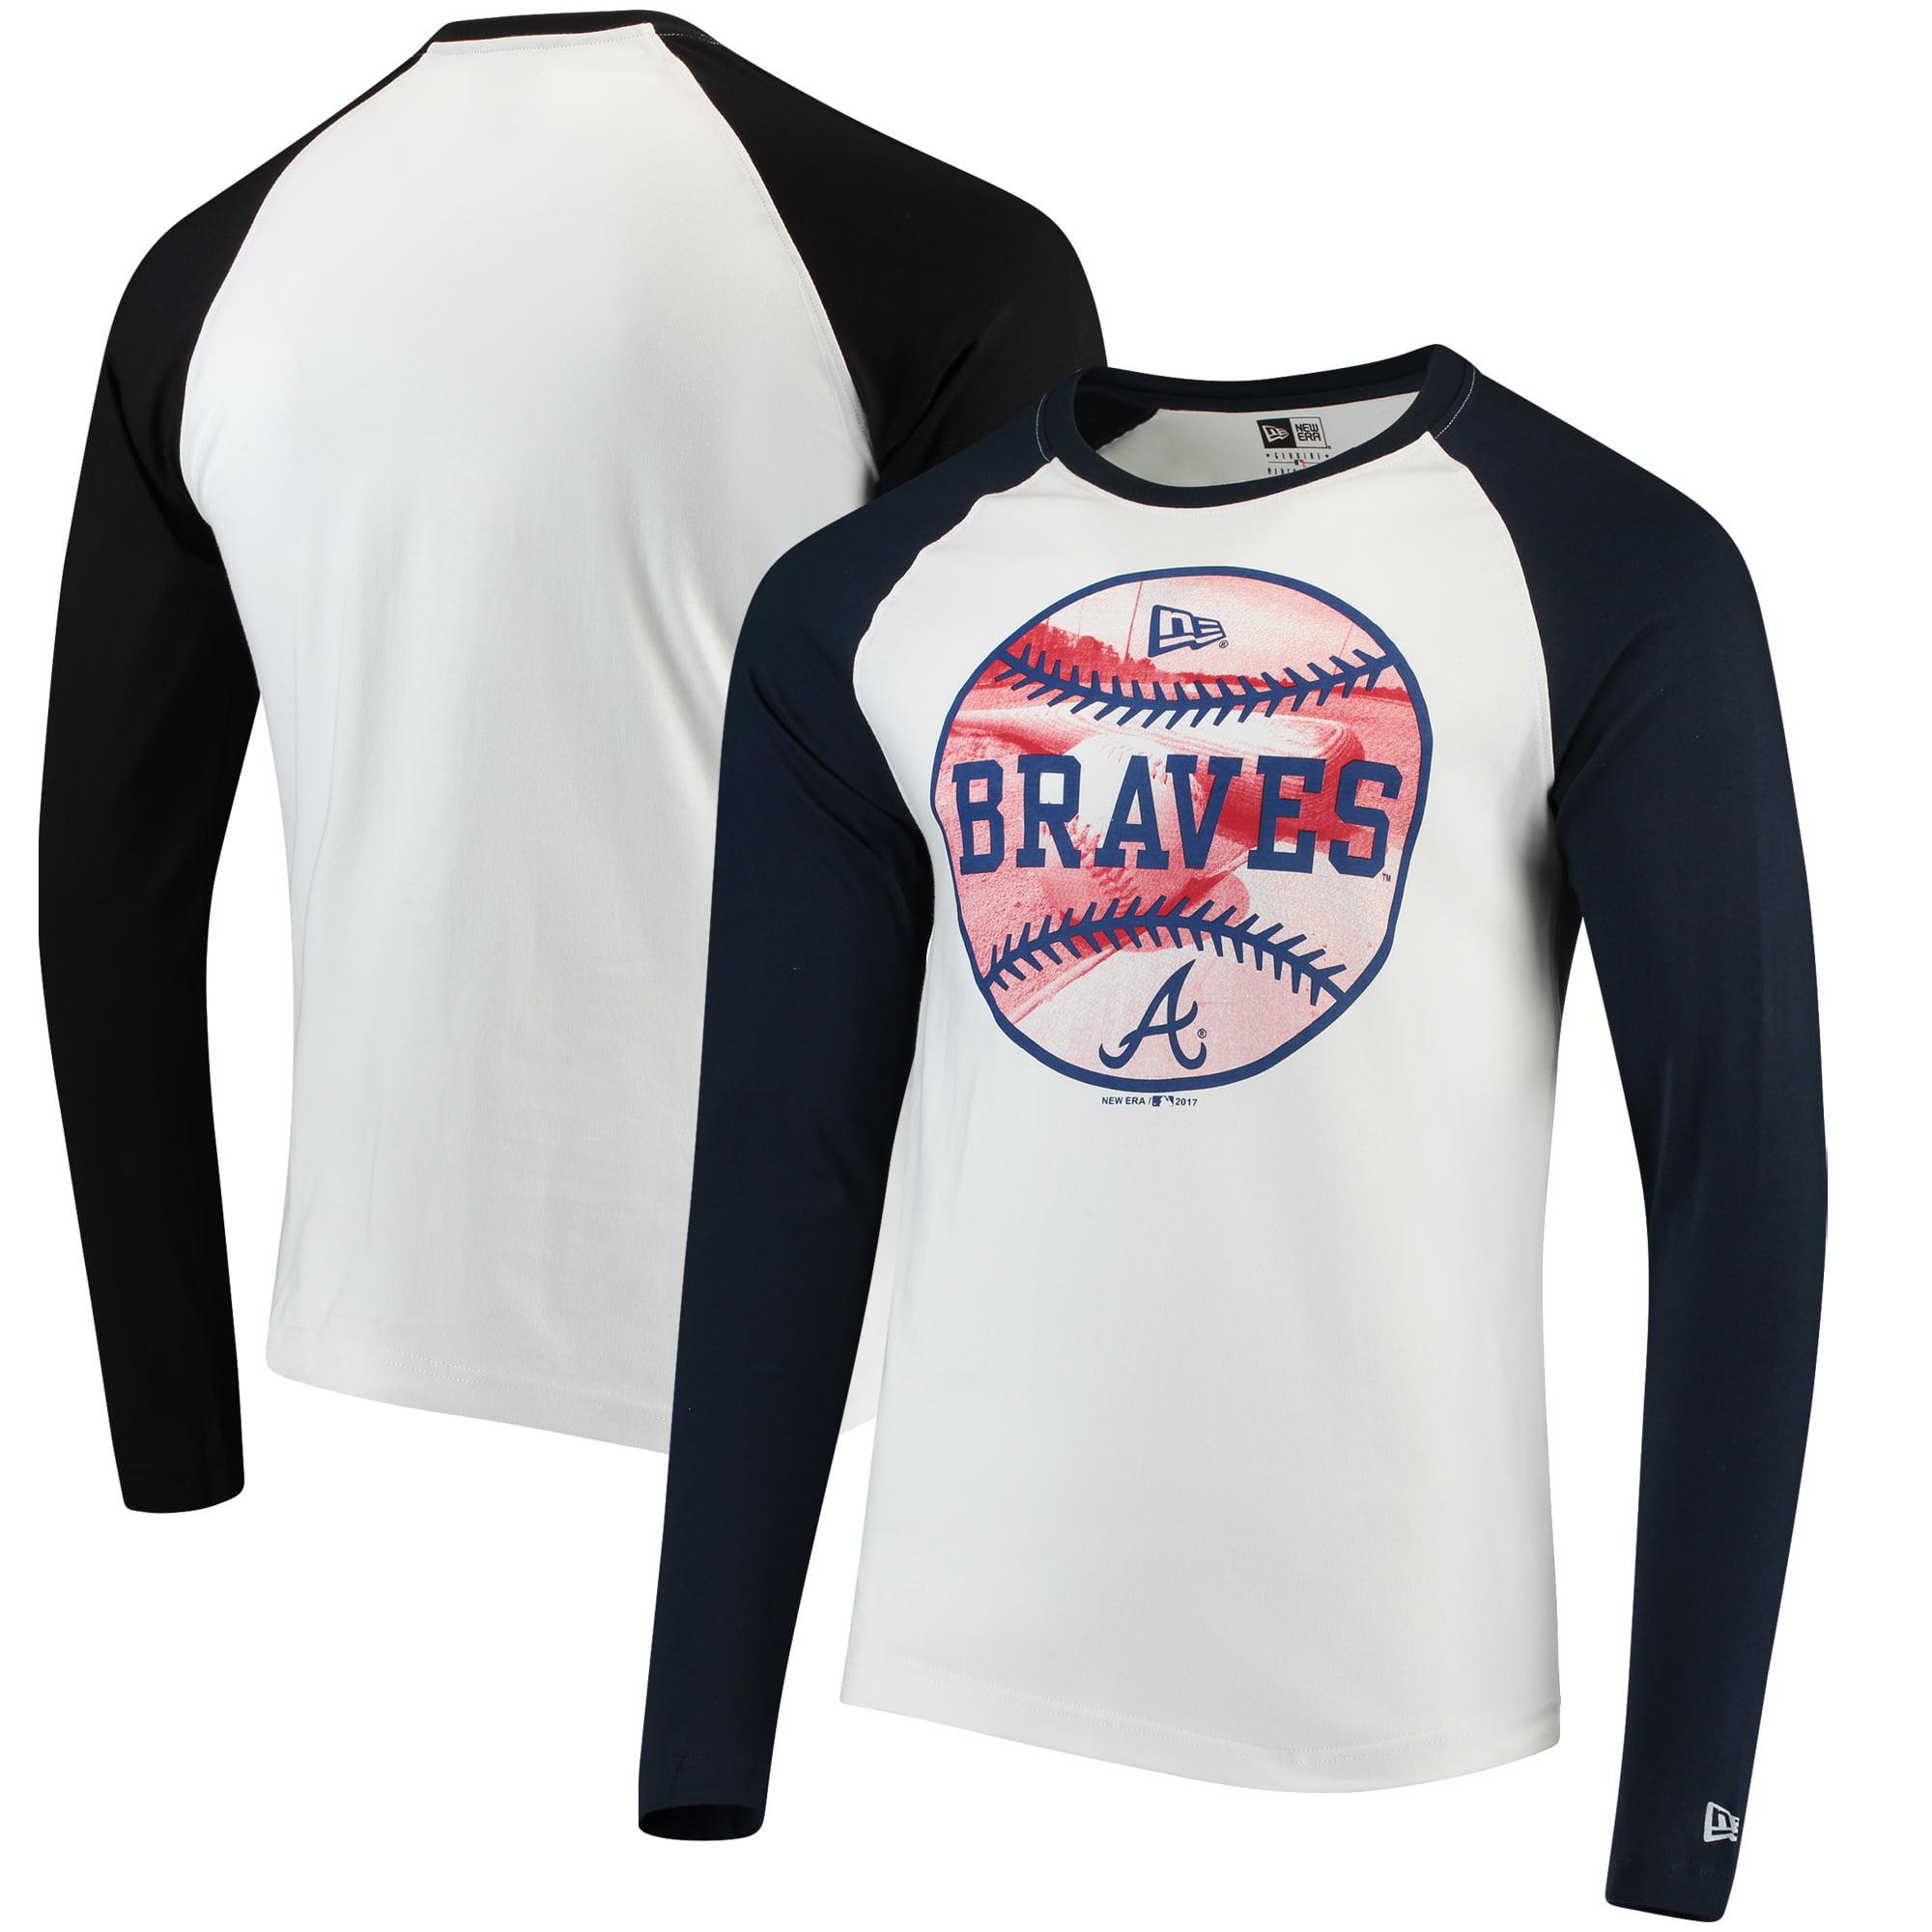 Atlanta Braves New Era Raglan Long Sleeve T-Shirt - White/Navy